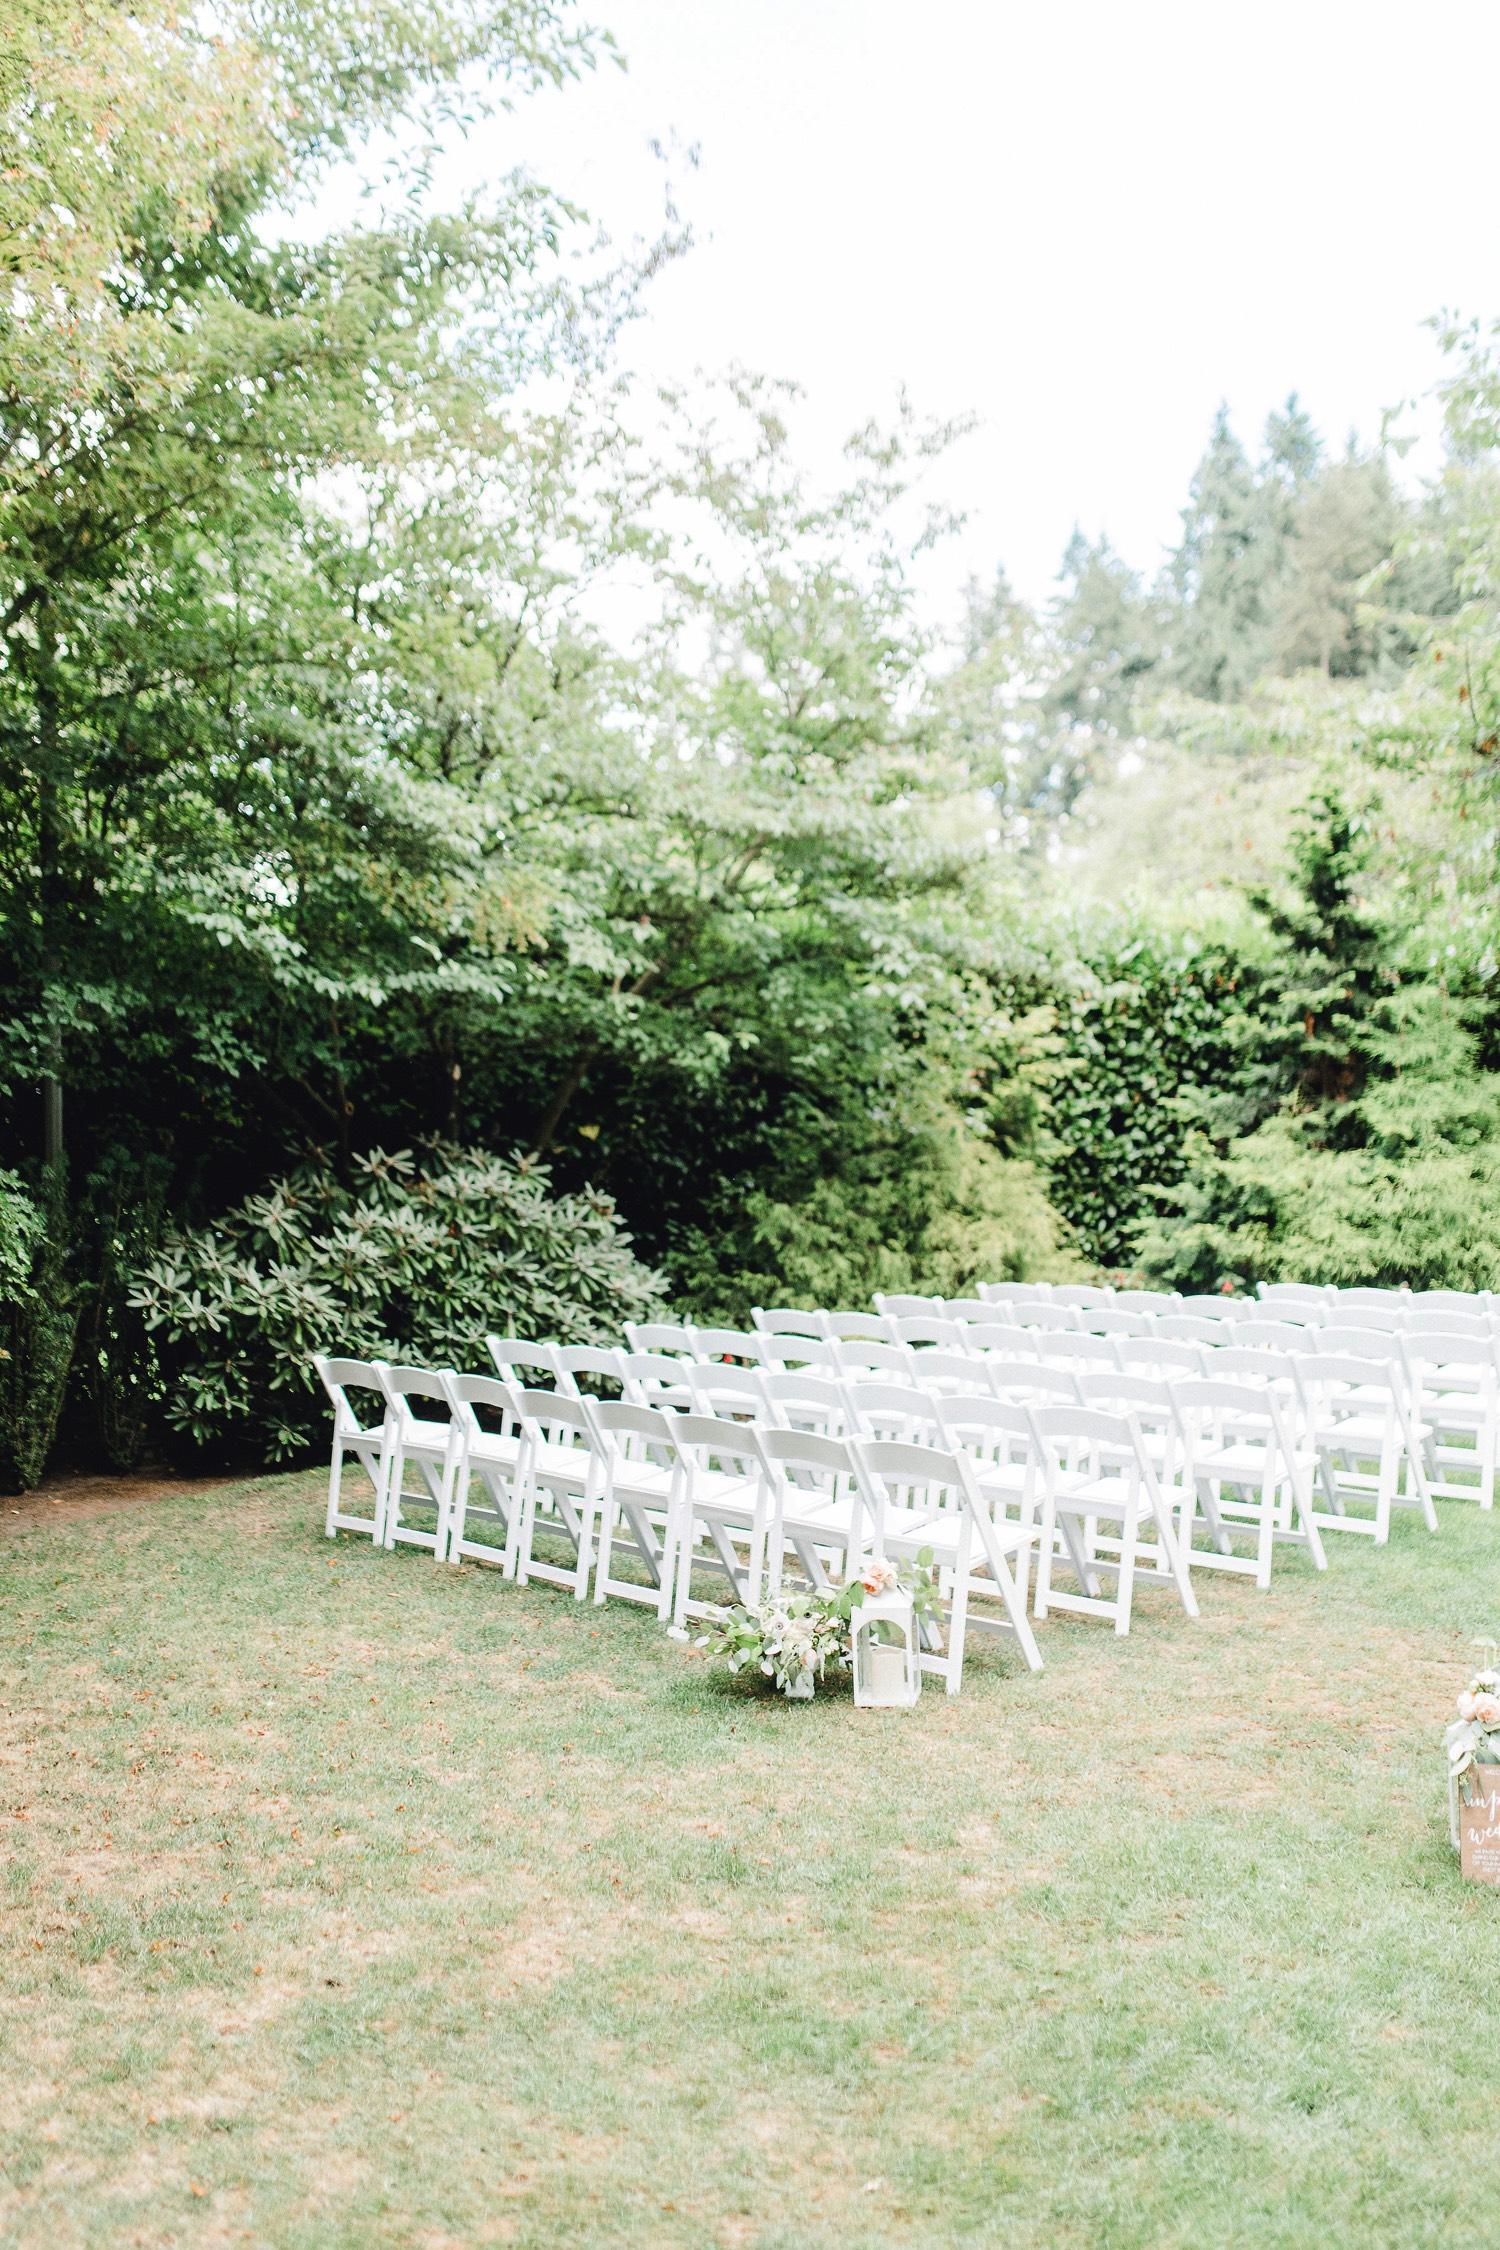 0000000000037_emmarosecompany_katiematt-3176_Photographer_PNW_House_Robinswood_Emma_Light_Company_Airy_Rose_and_Wedding_Seattle.jpg